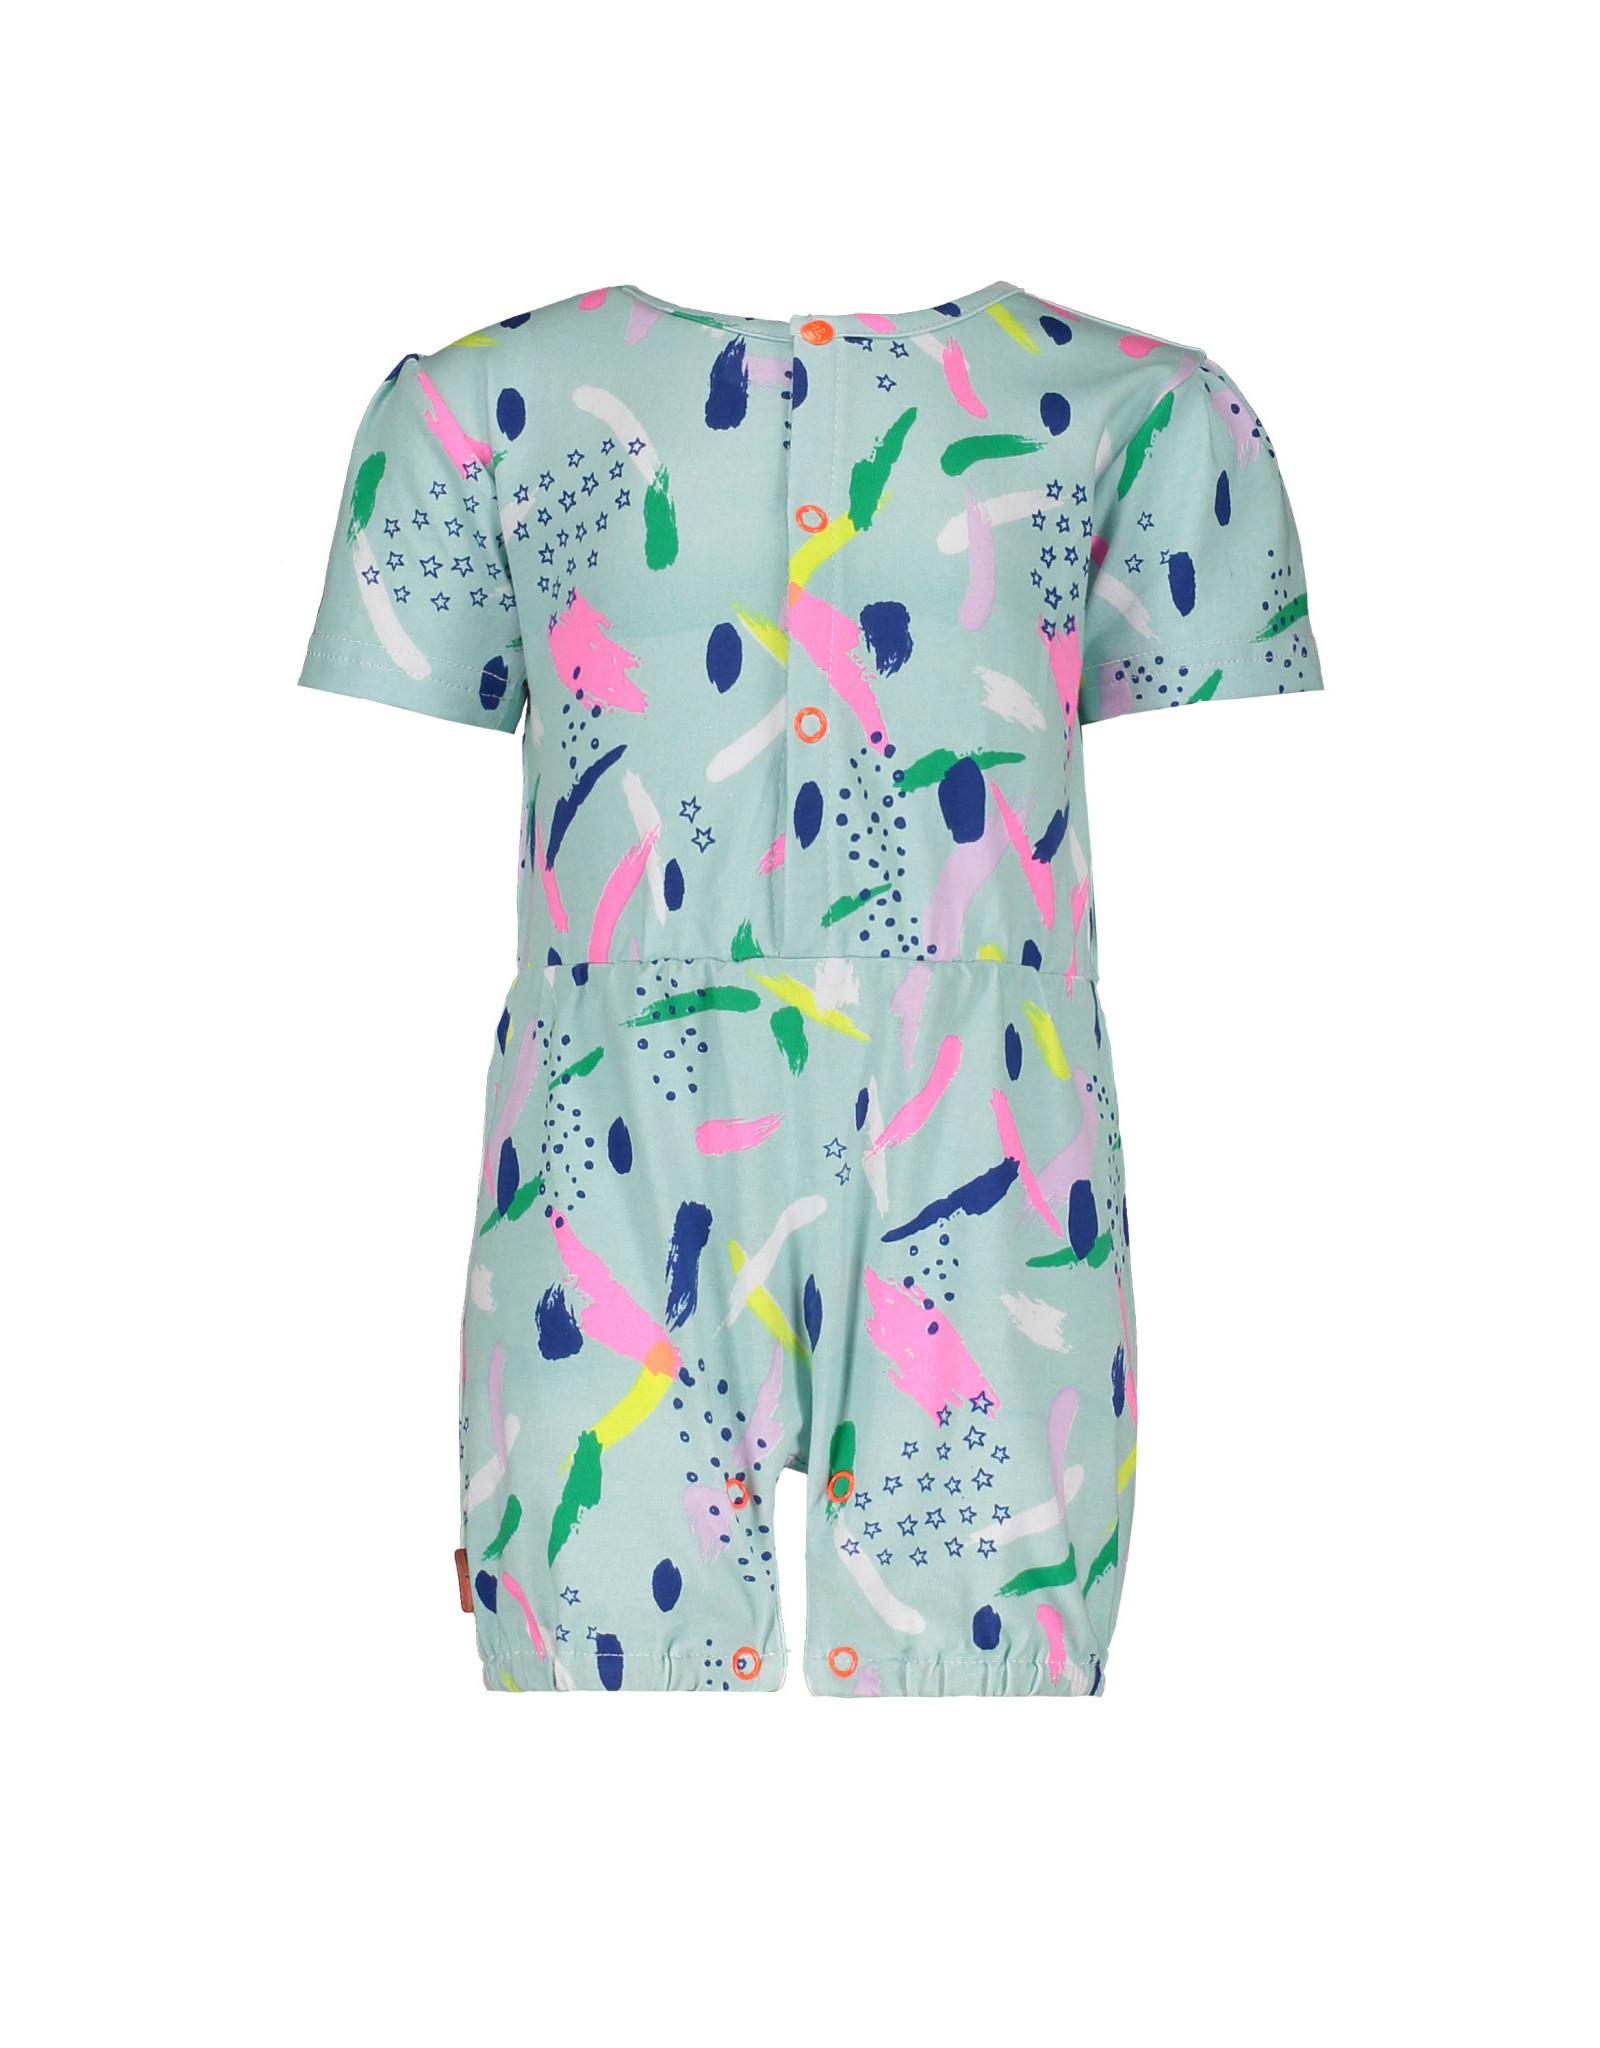 Bampidano Bampidano baby meisjes jumpsuit Esmee Blue Allover